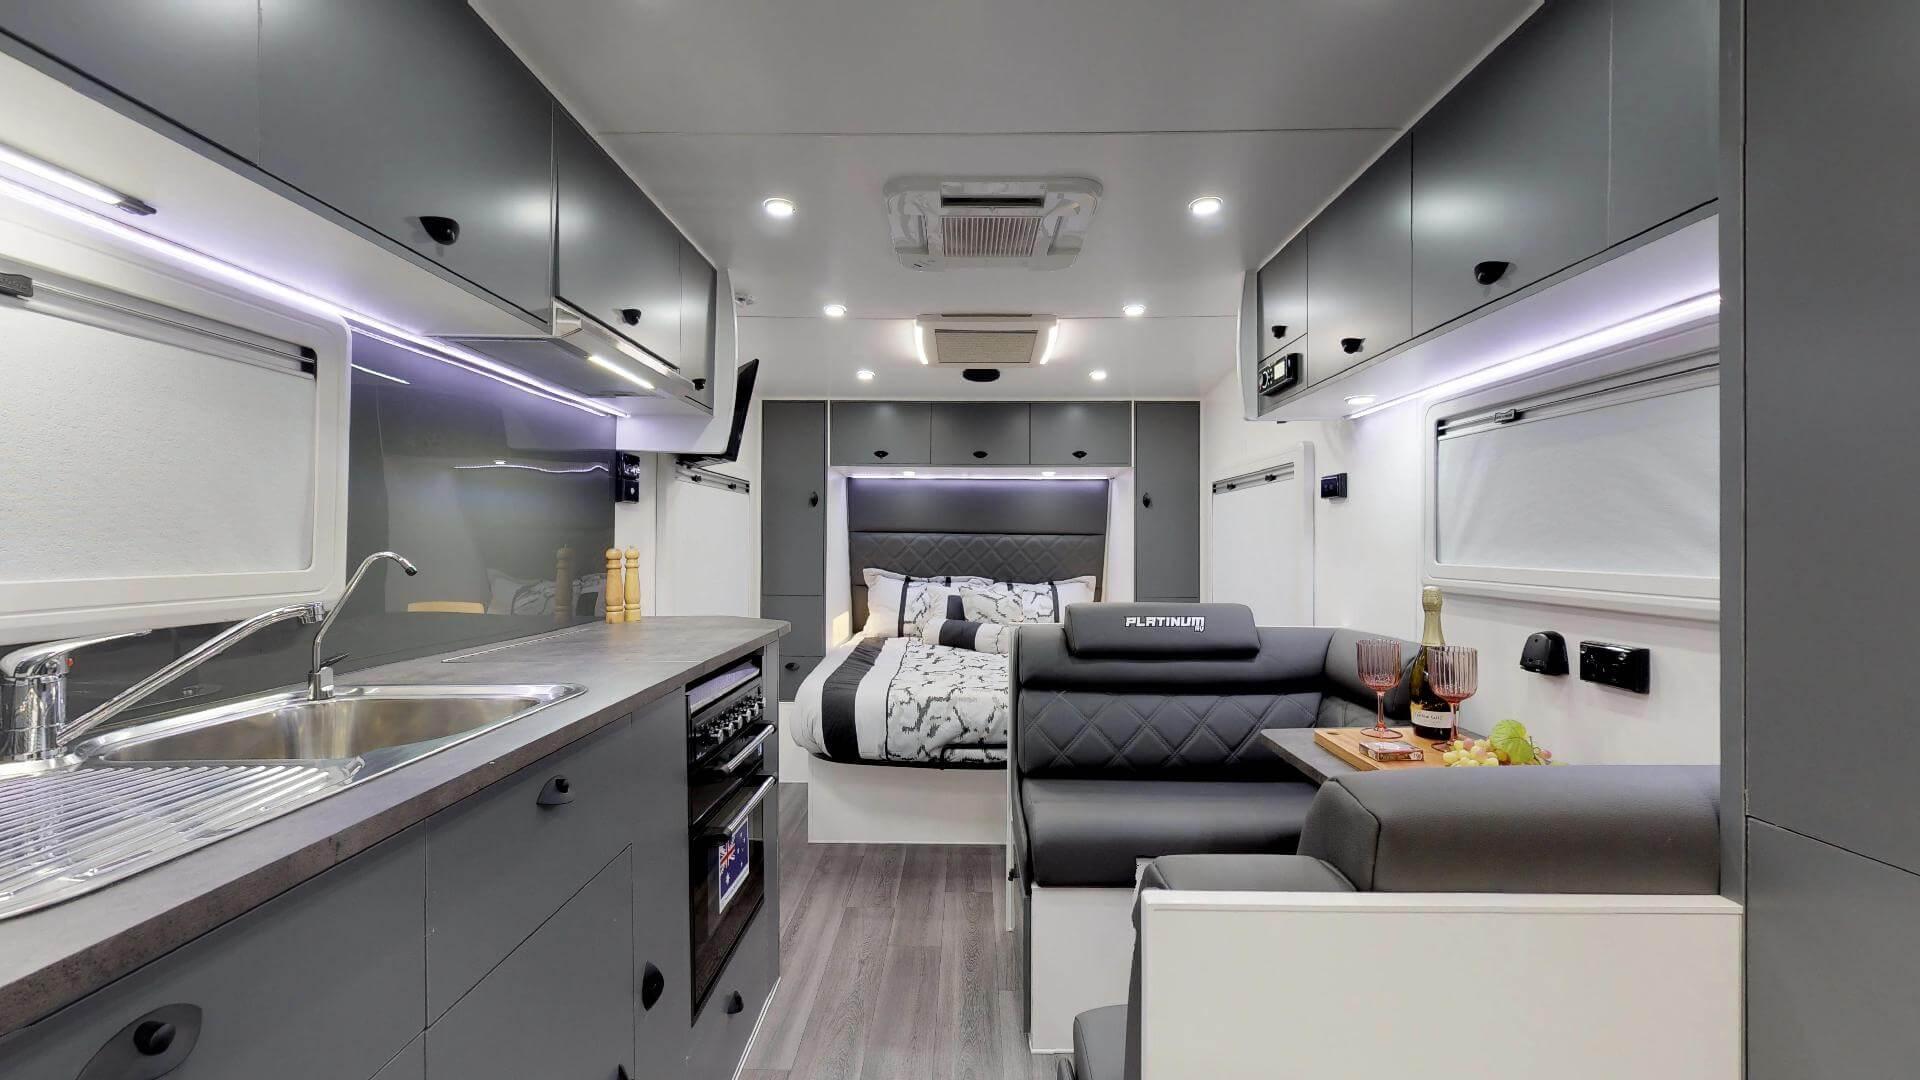 21ft-Platinum-RV-Signature-Offroad-By-Condor-Caravans-02152019_185806